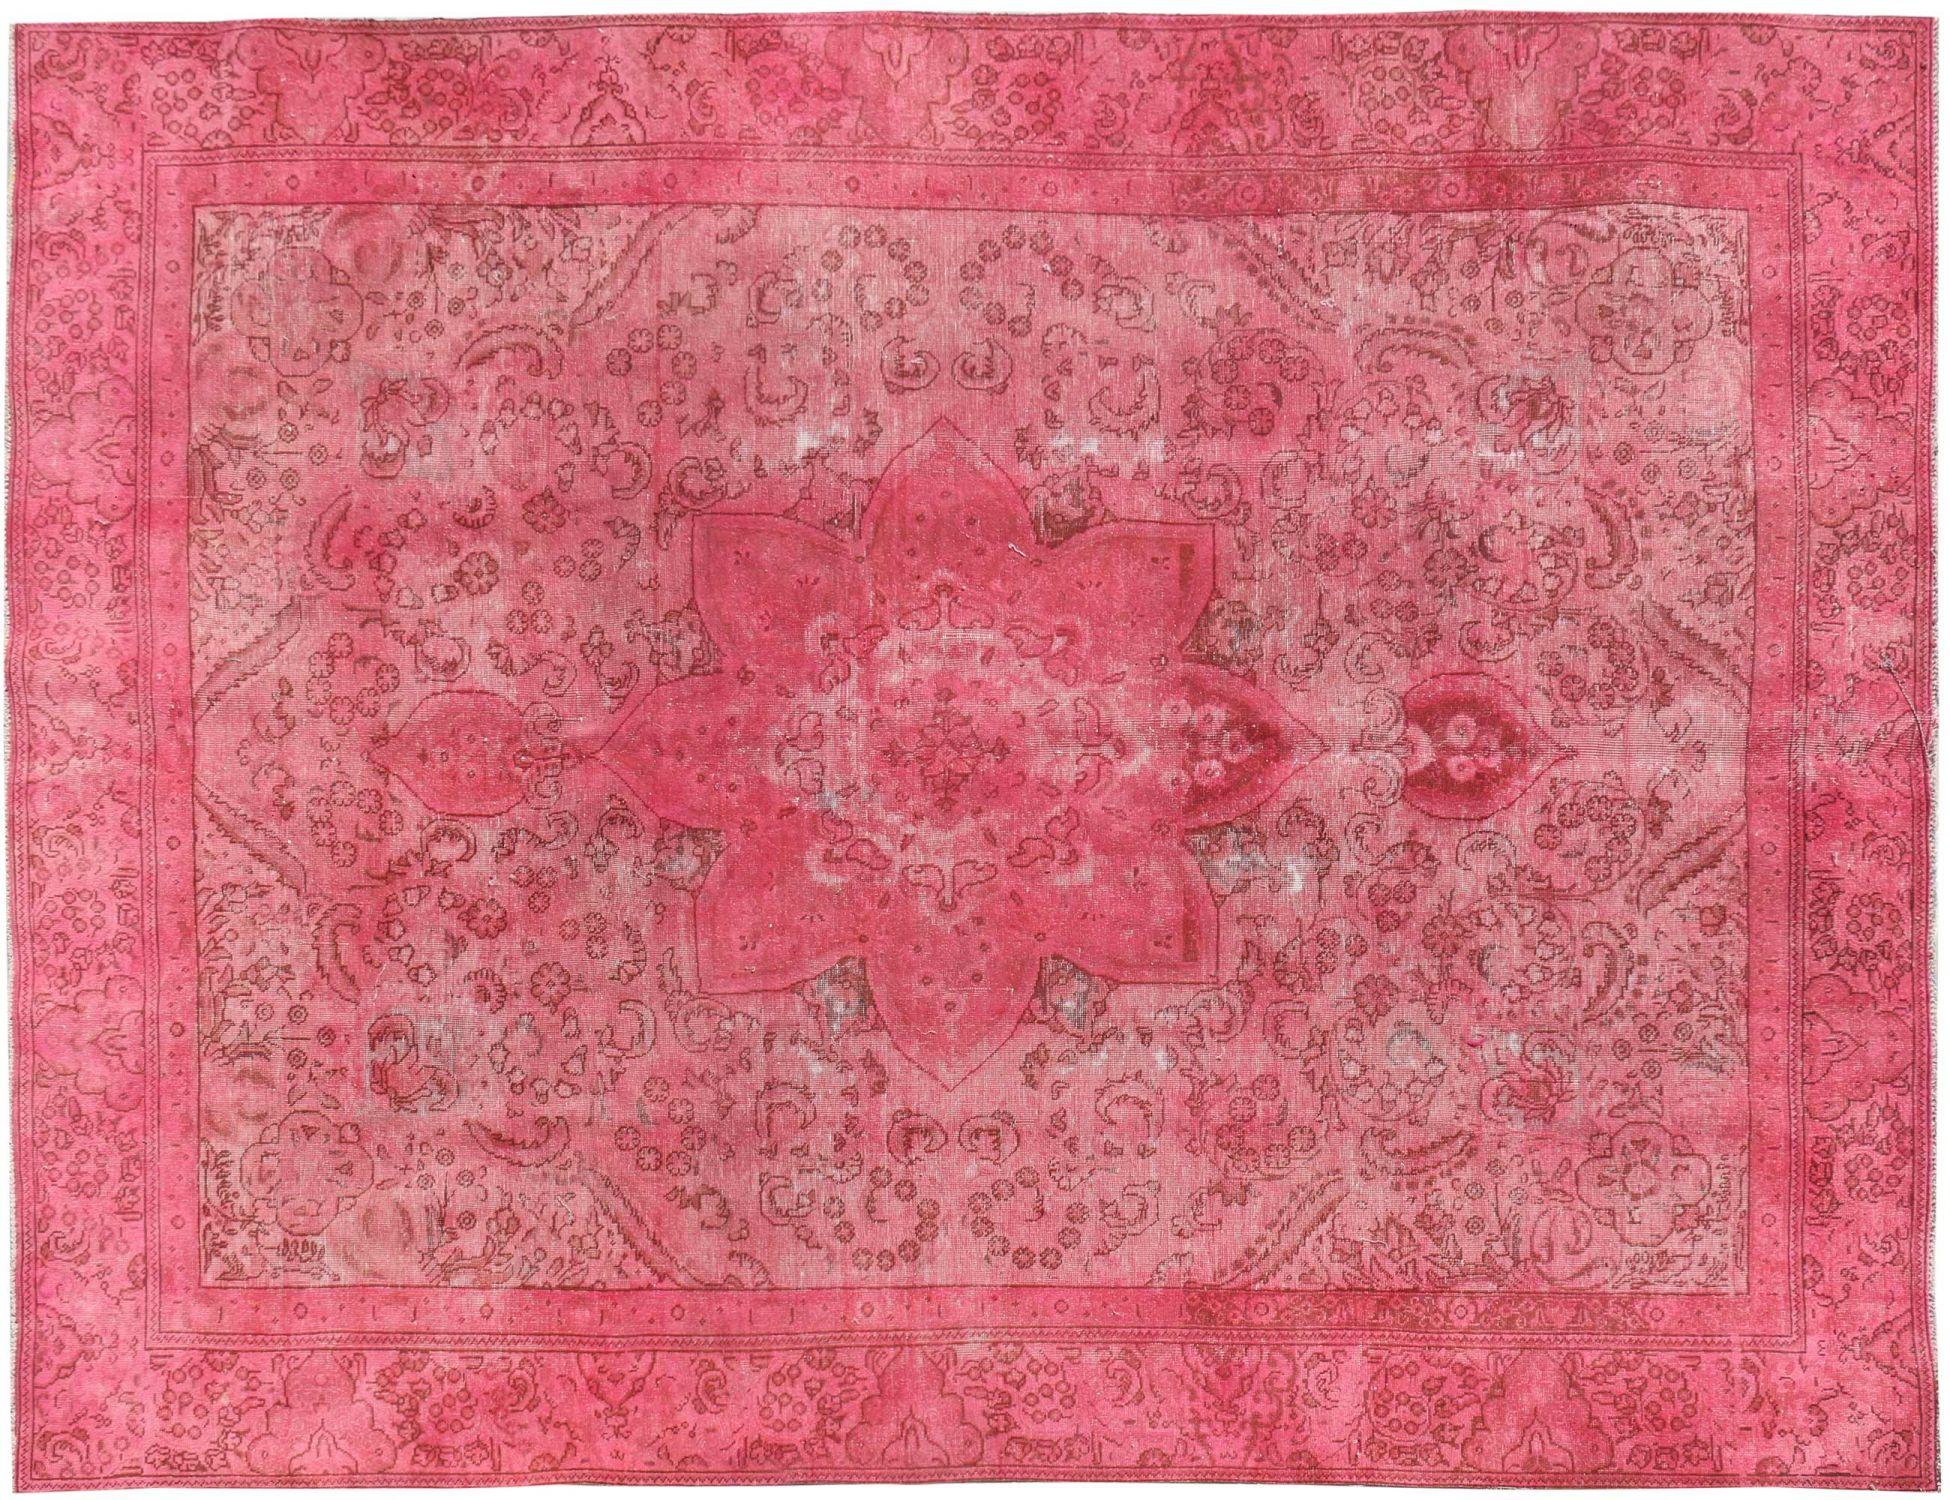 Perzisch Vintage Tapijt  roze <br/>377 x 266 cm